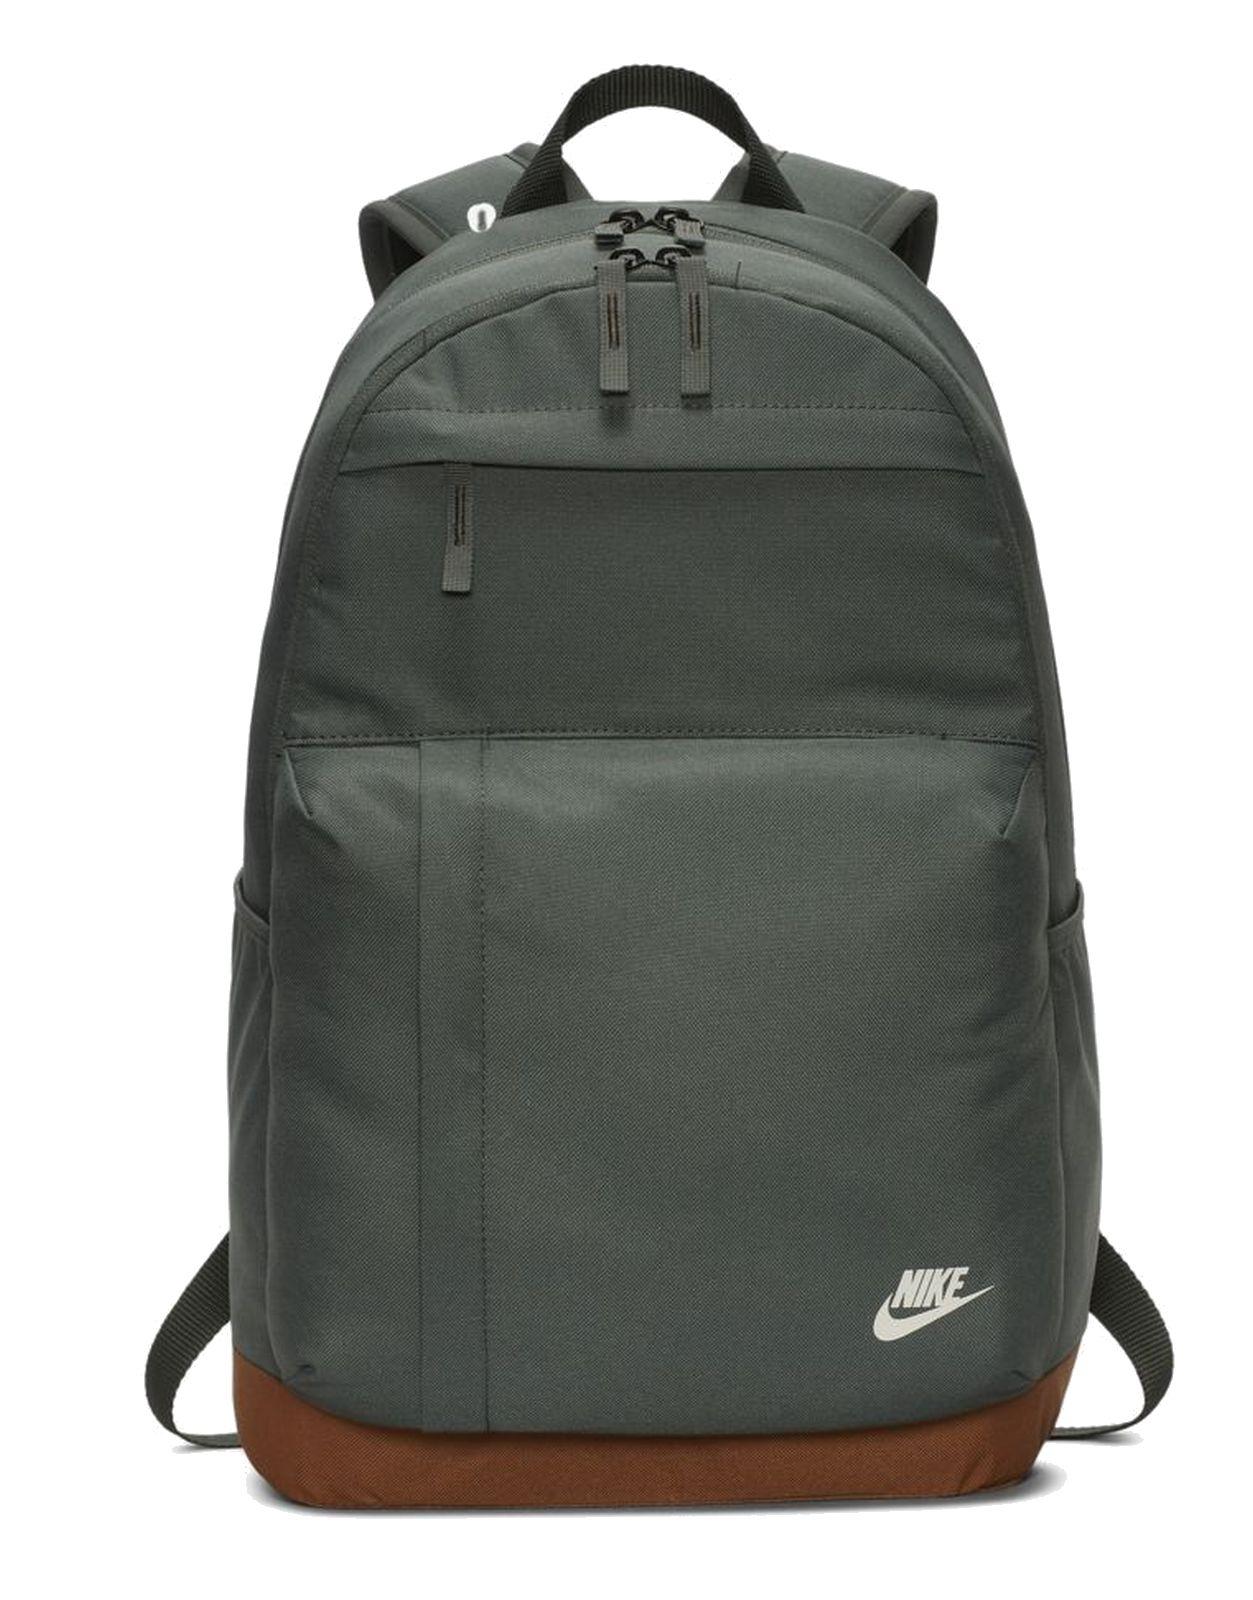 Elemental Informal Detalles 344 Verde De Escuela Mochila Ba5768 Deporte Nike Rjq3L54A